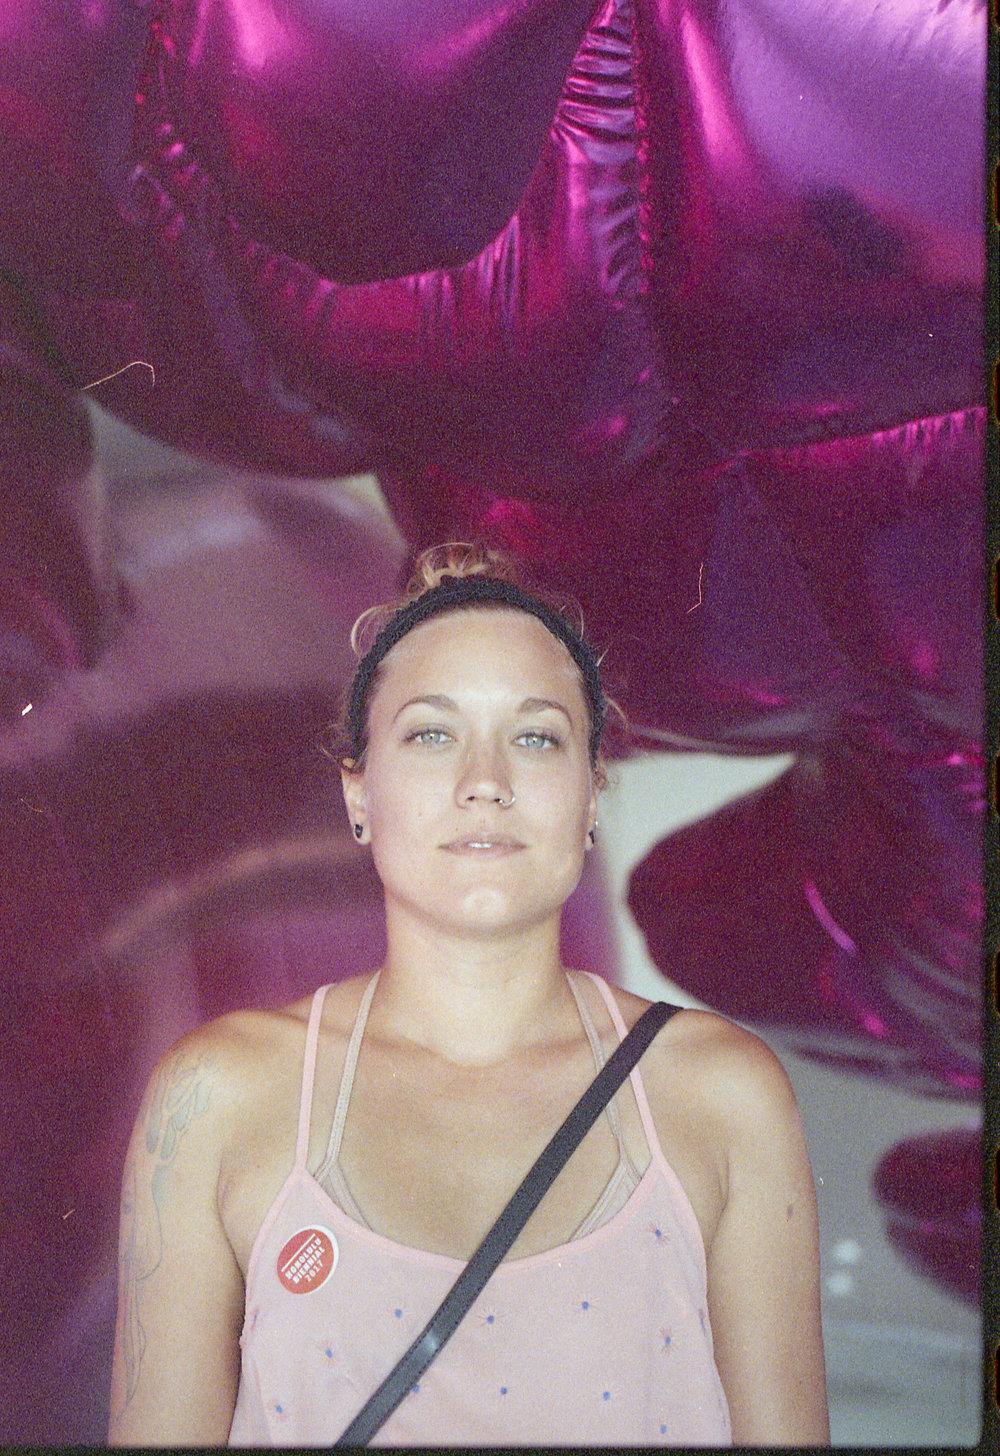 Honolulu Biennial - Tien Austin Photography